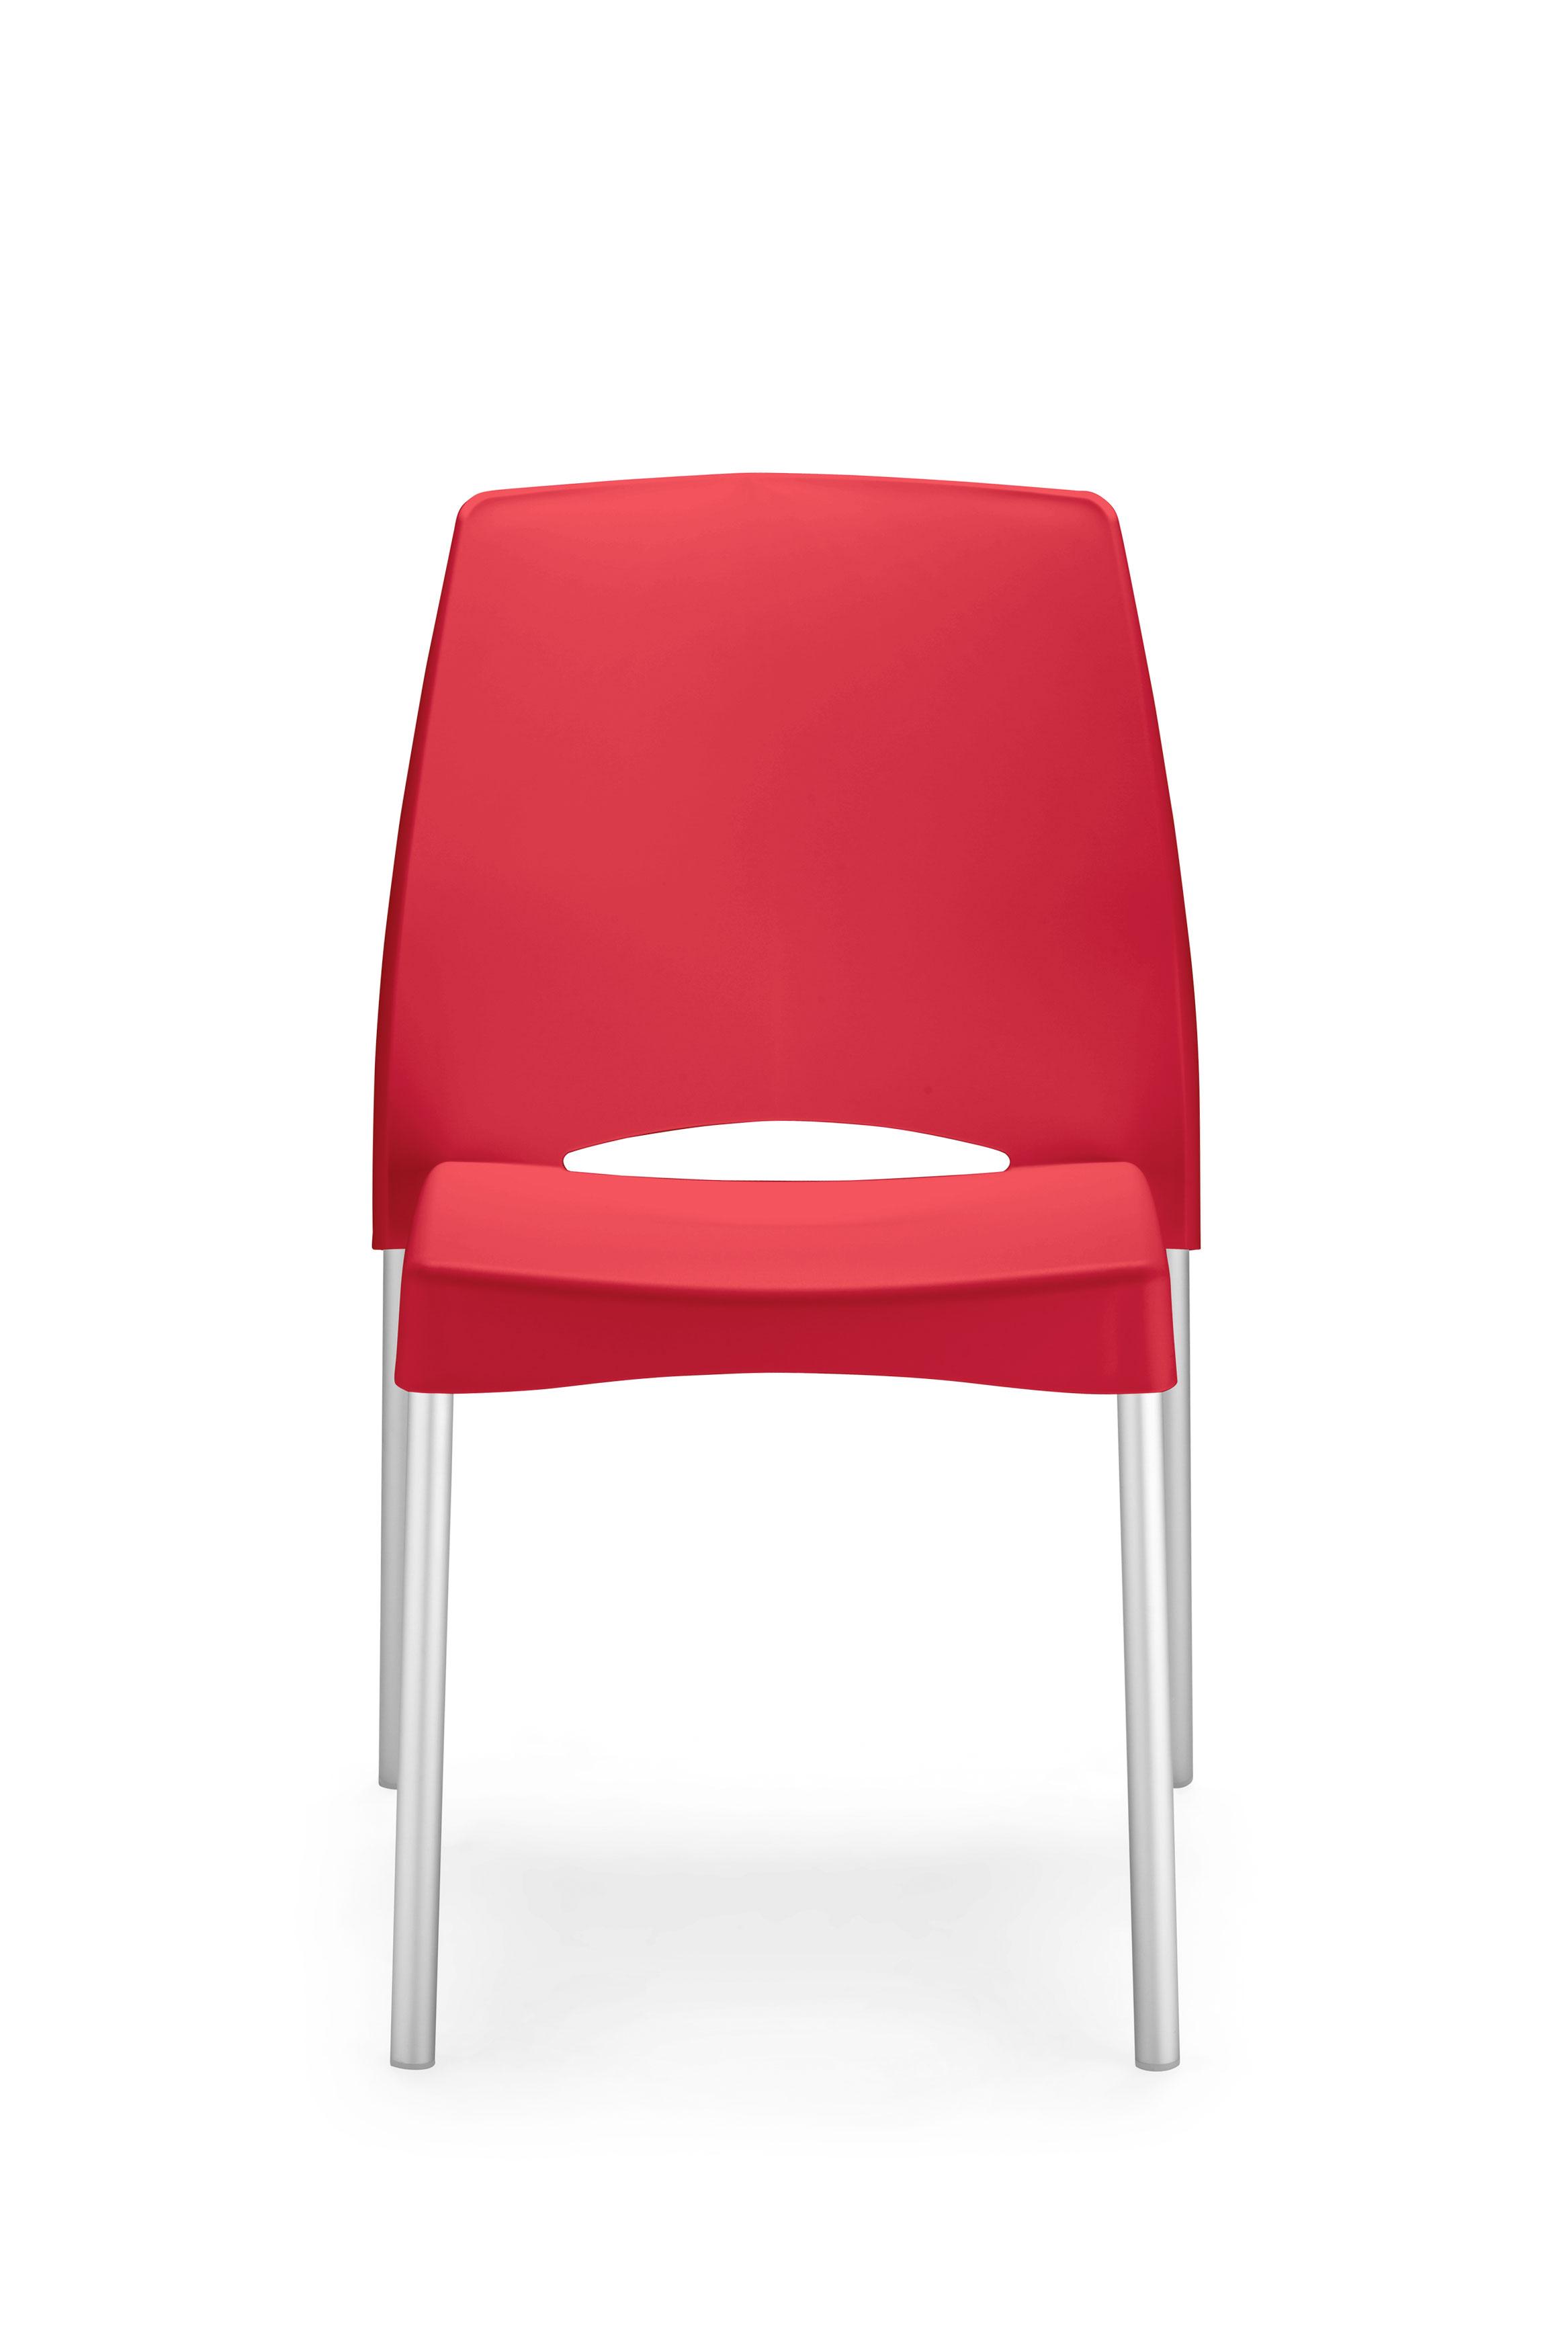 code fiche produit 2095287. Black Bedroom Furniture Sets. Home Design Ideas